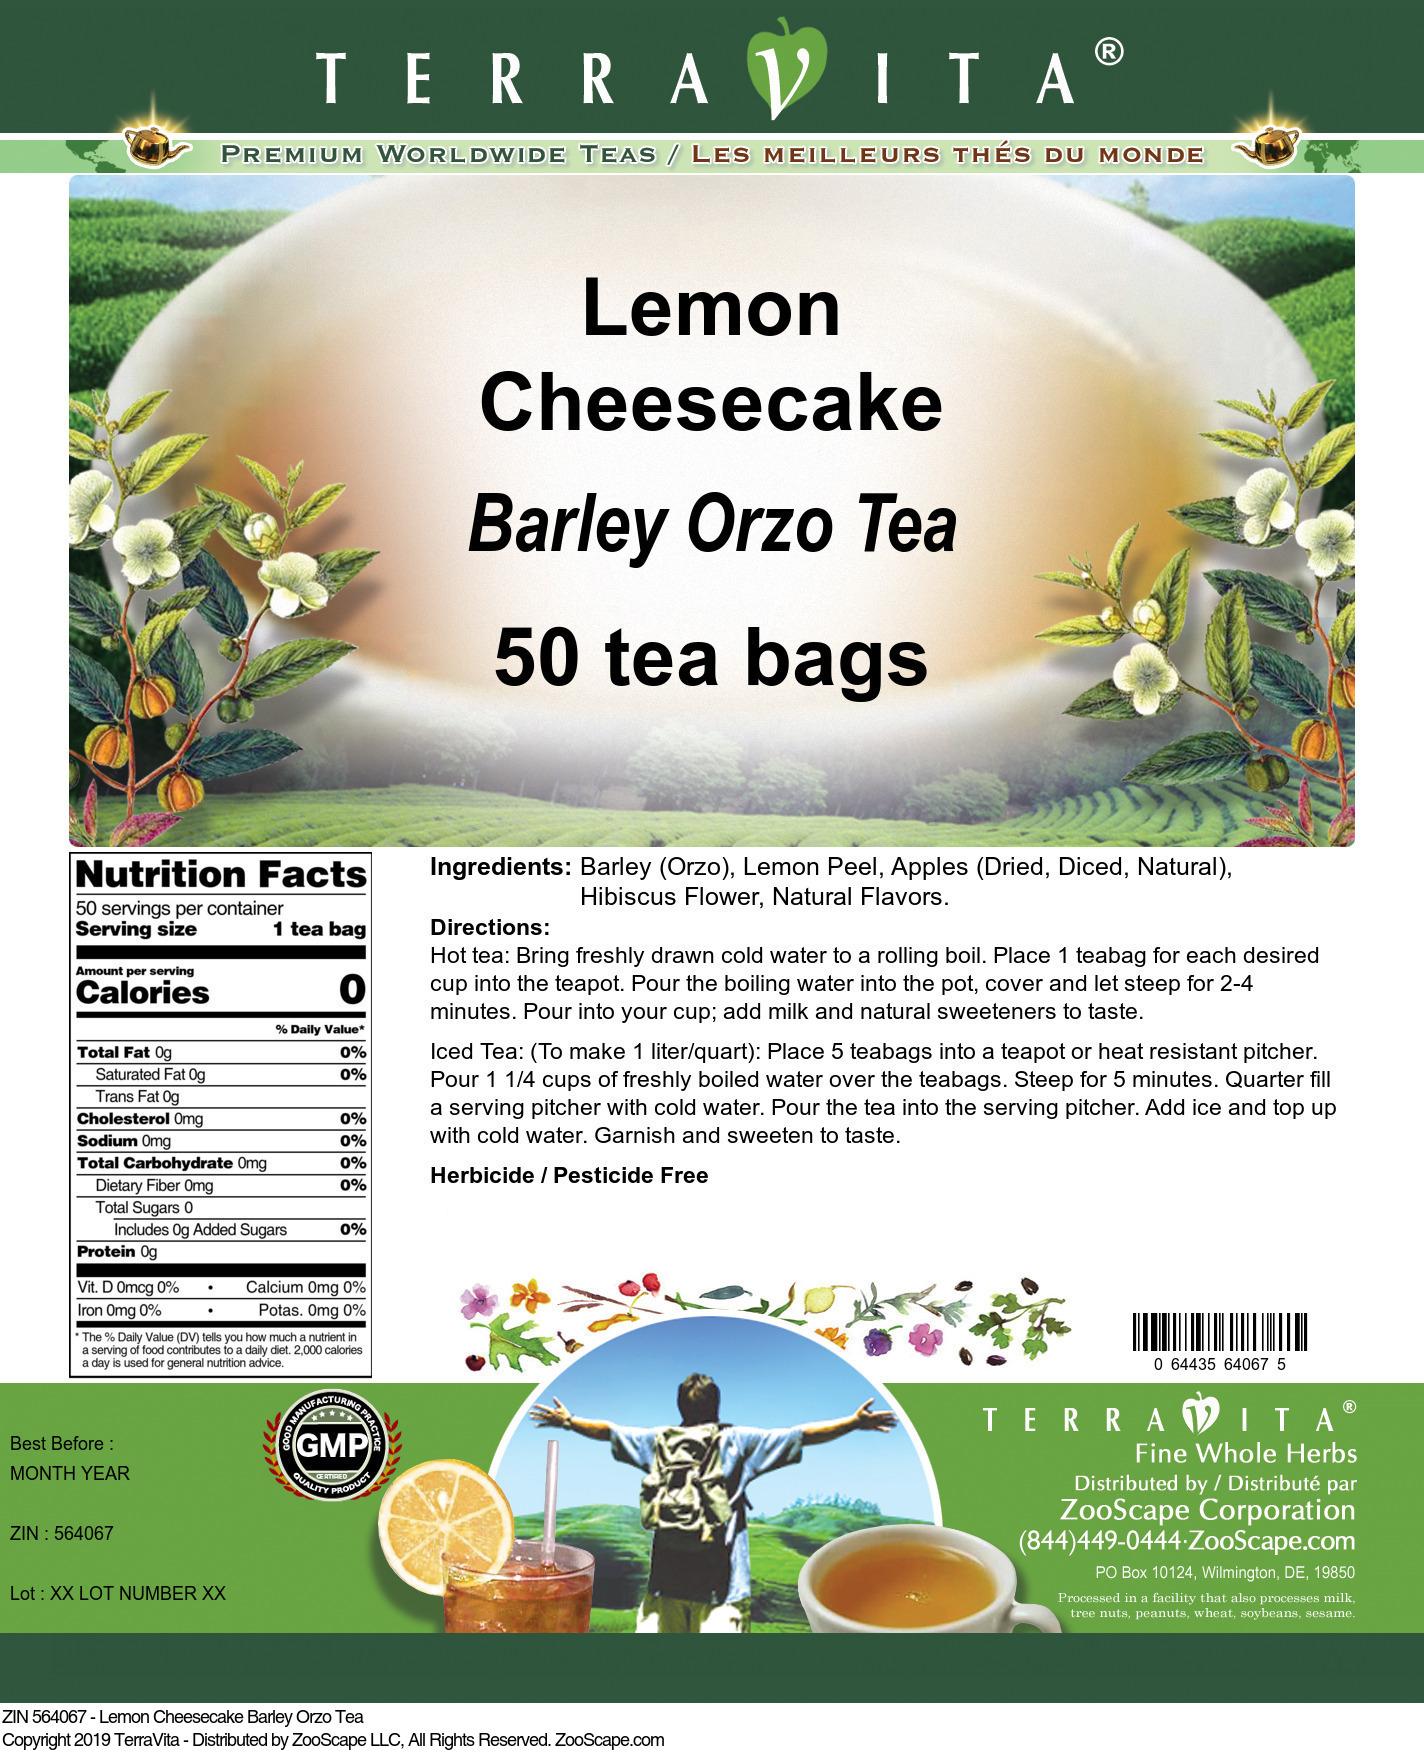 Lemon Cheesecake Barley Orzo